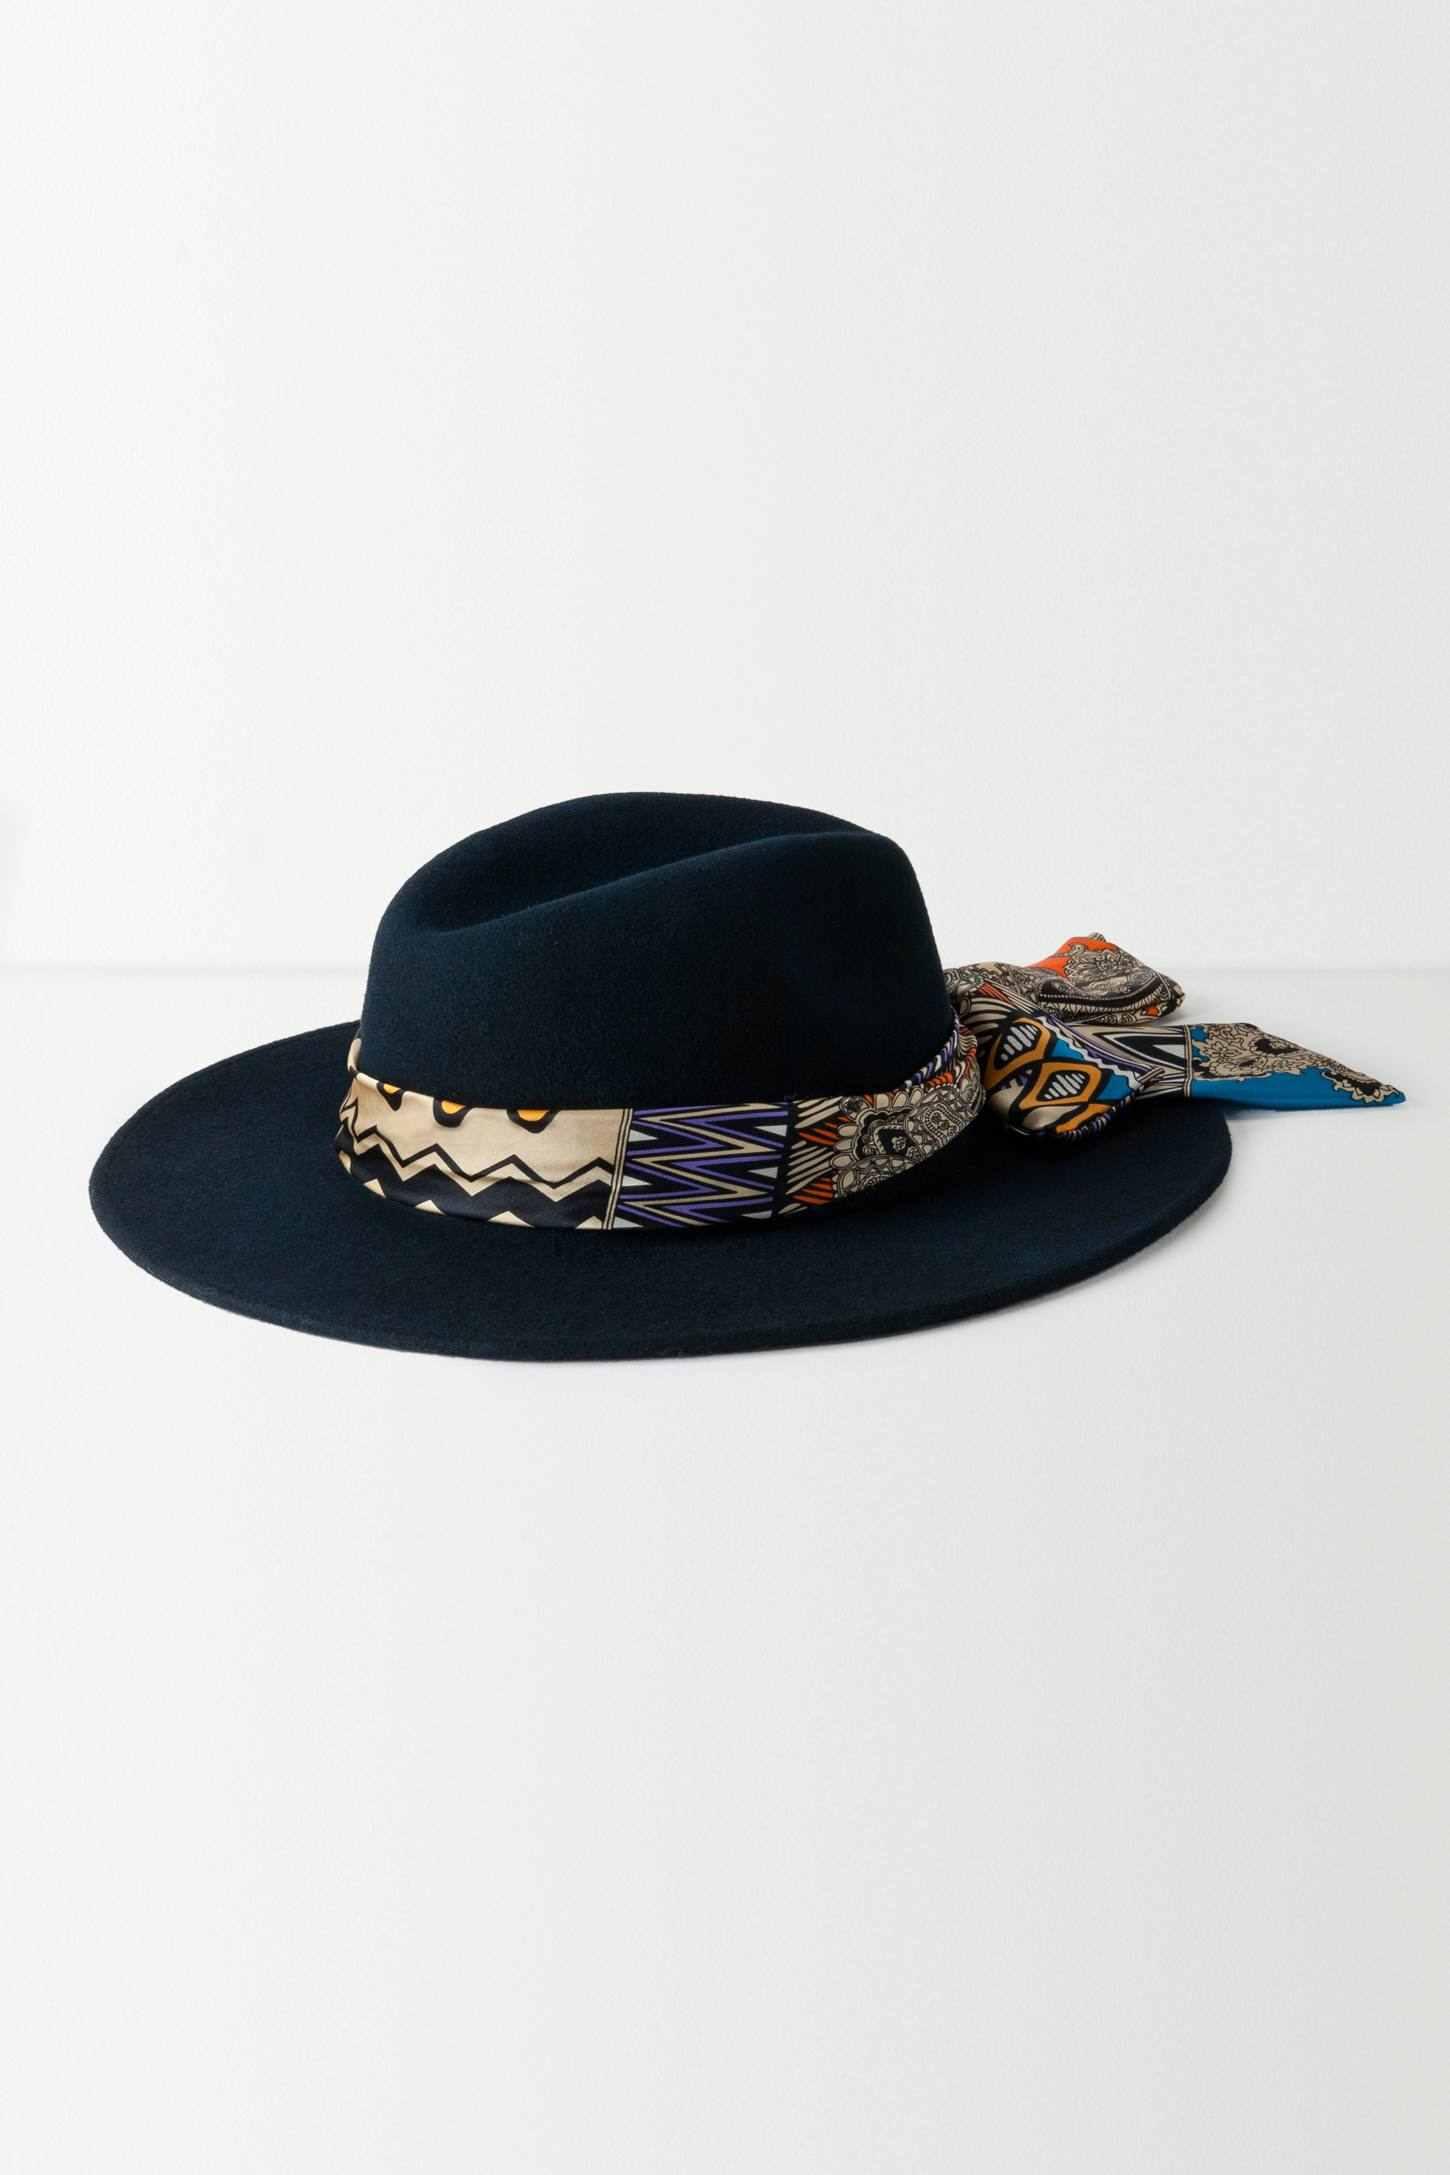 Anthropologie - Chapeau(63 €)